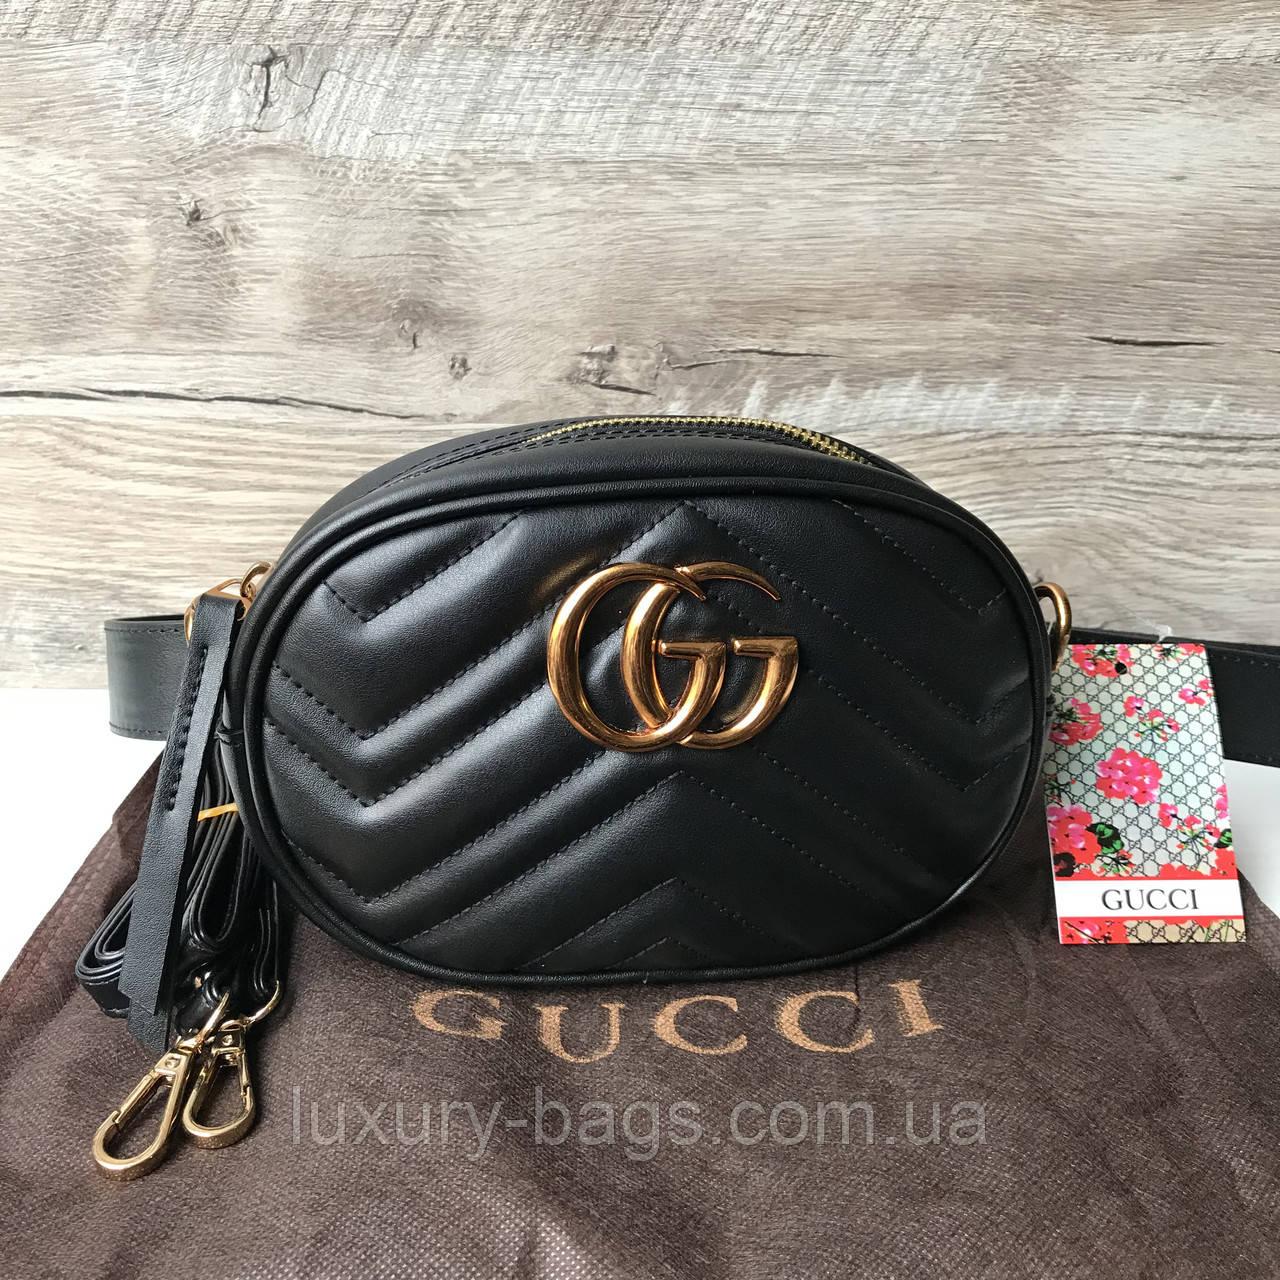 239e1e353925 Женская сумка на пояс Gucci Marmont Гуччи, цена 788 грн., купить в ...